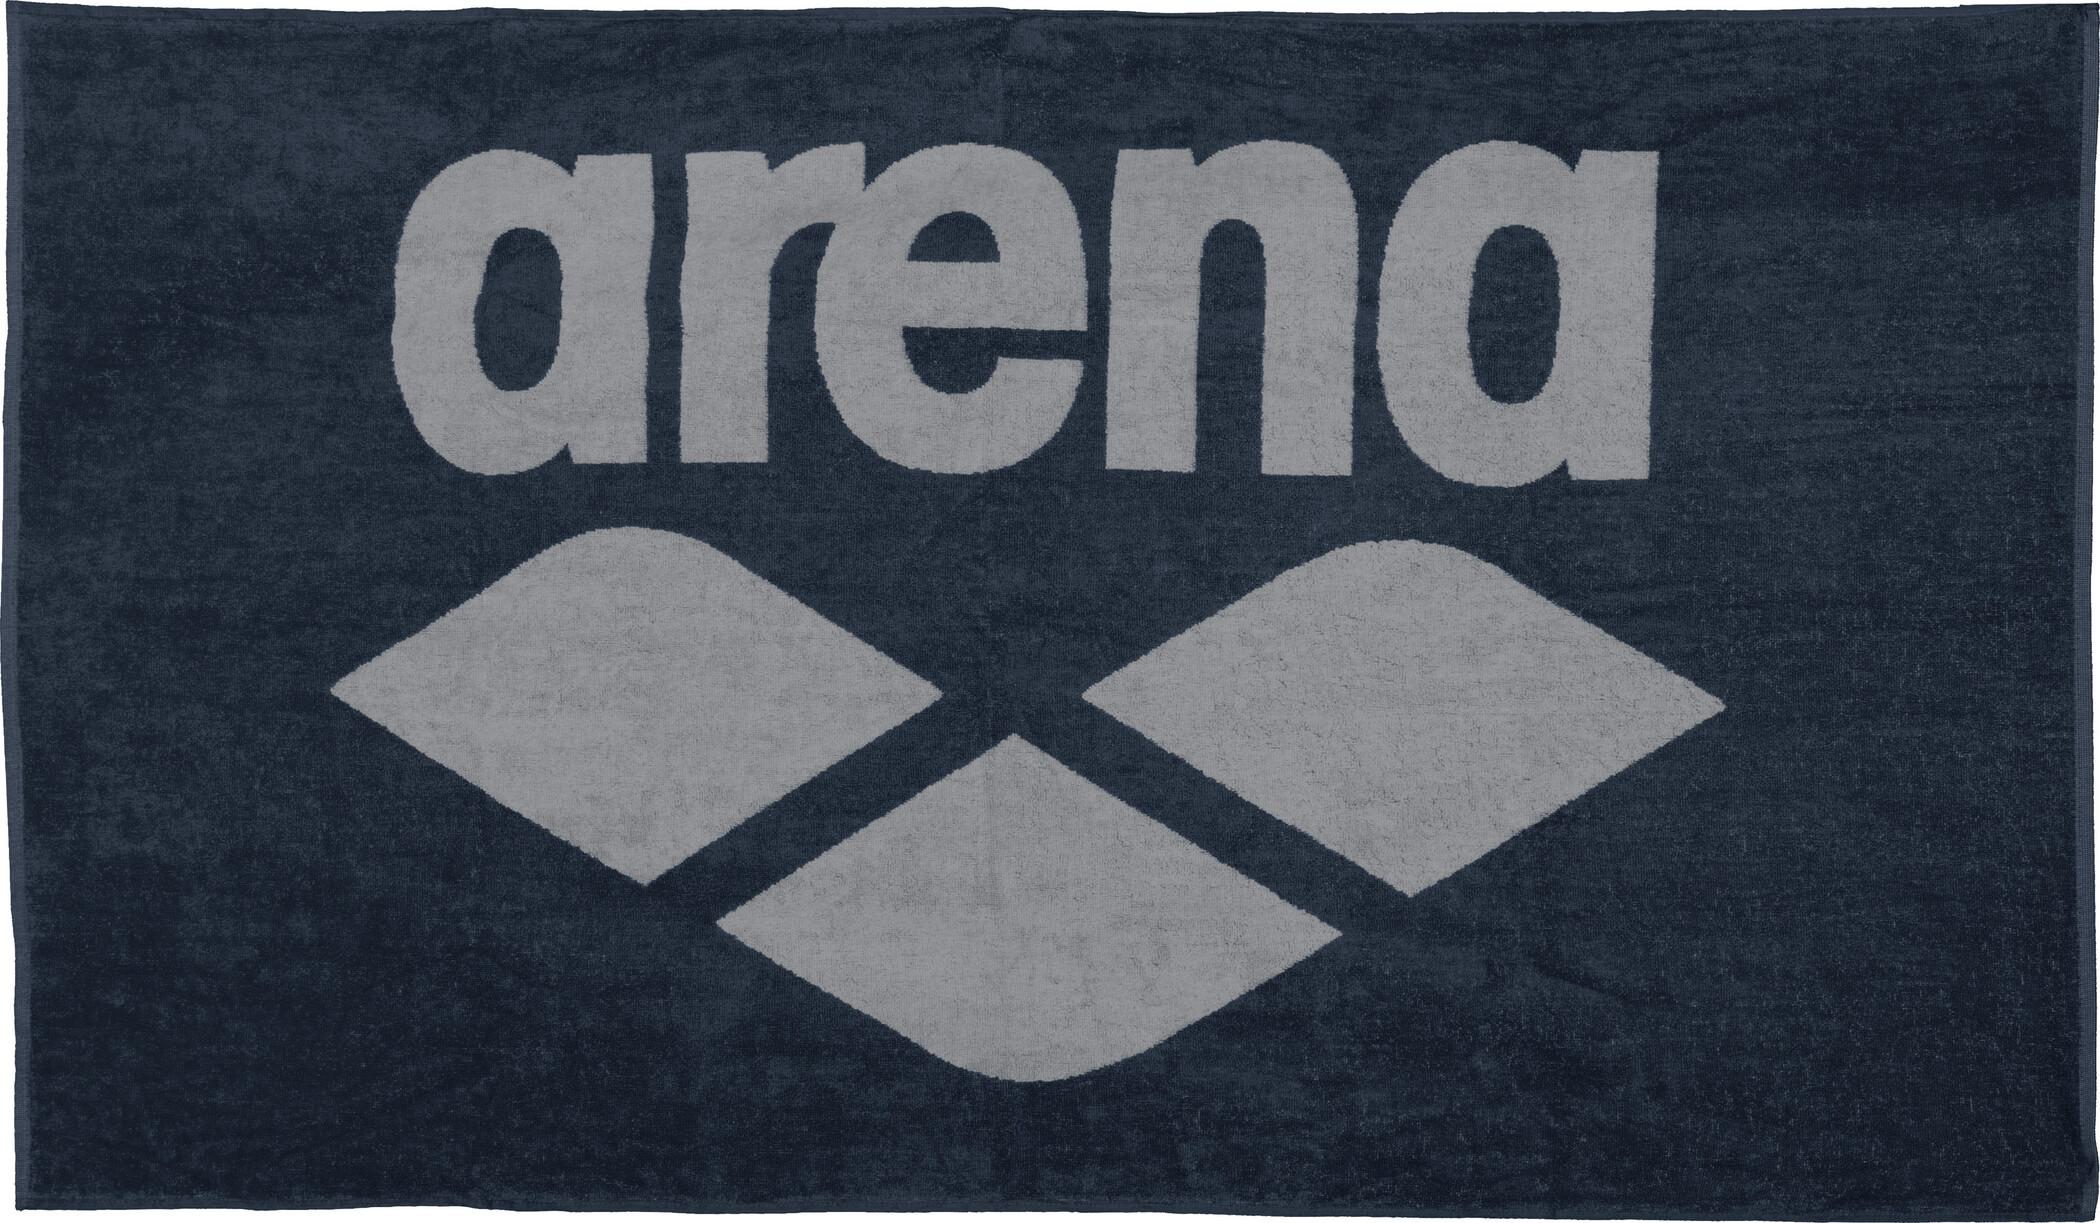 arena Pool Soft Håndklæde, navy-grey | Misc. Multimedia